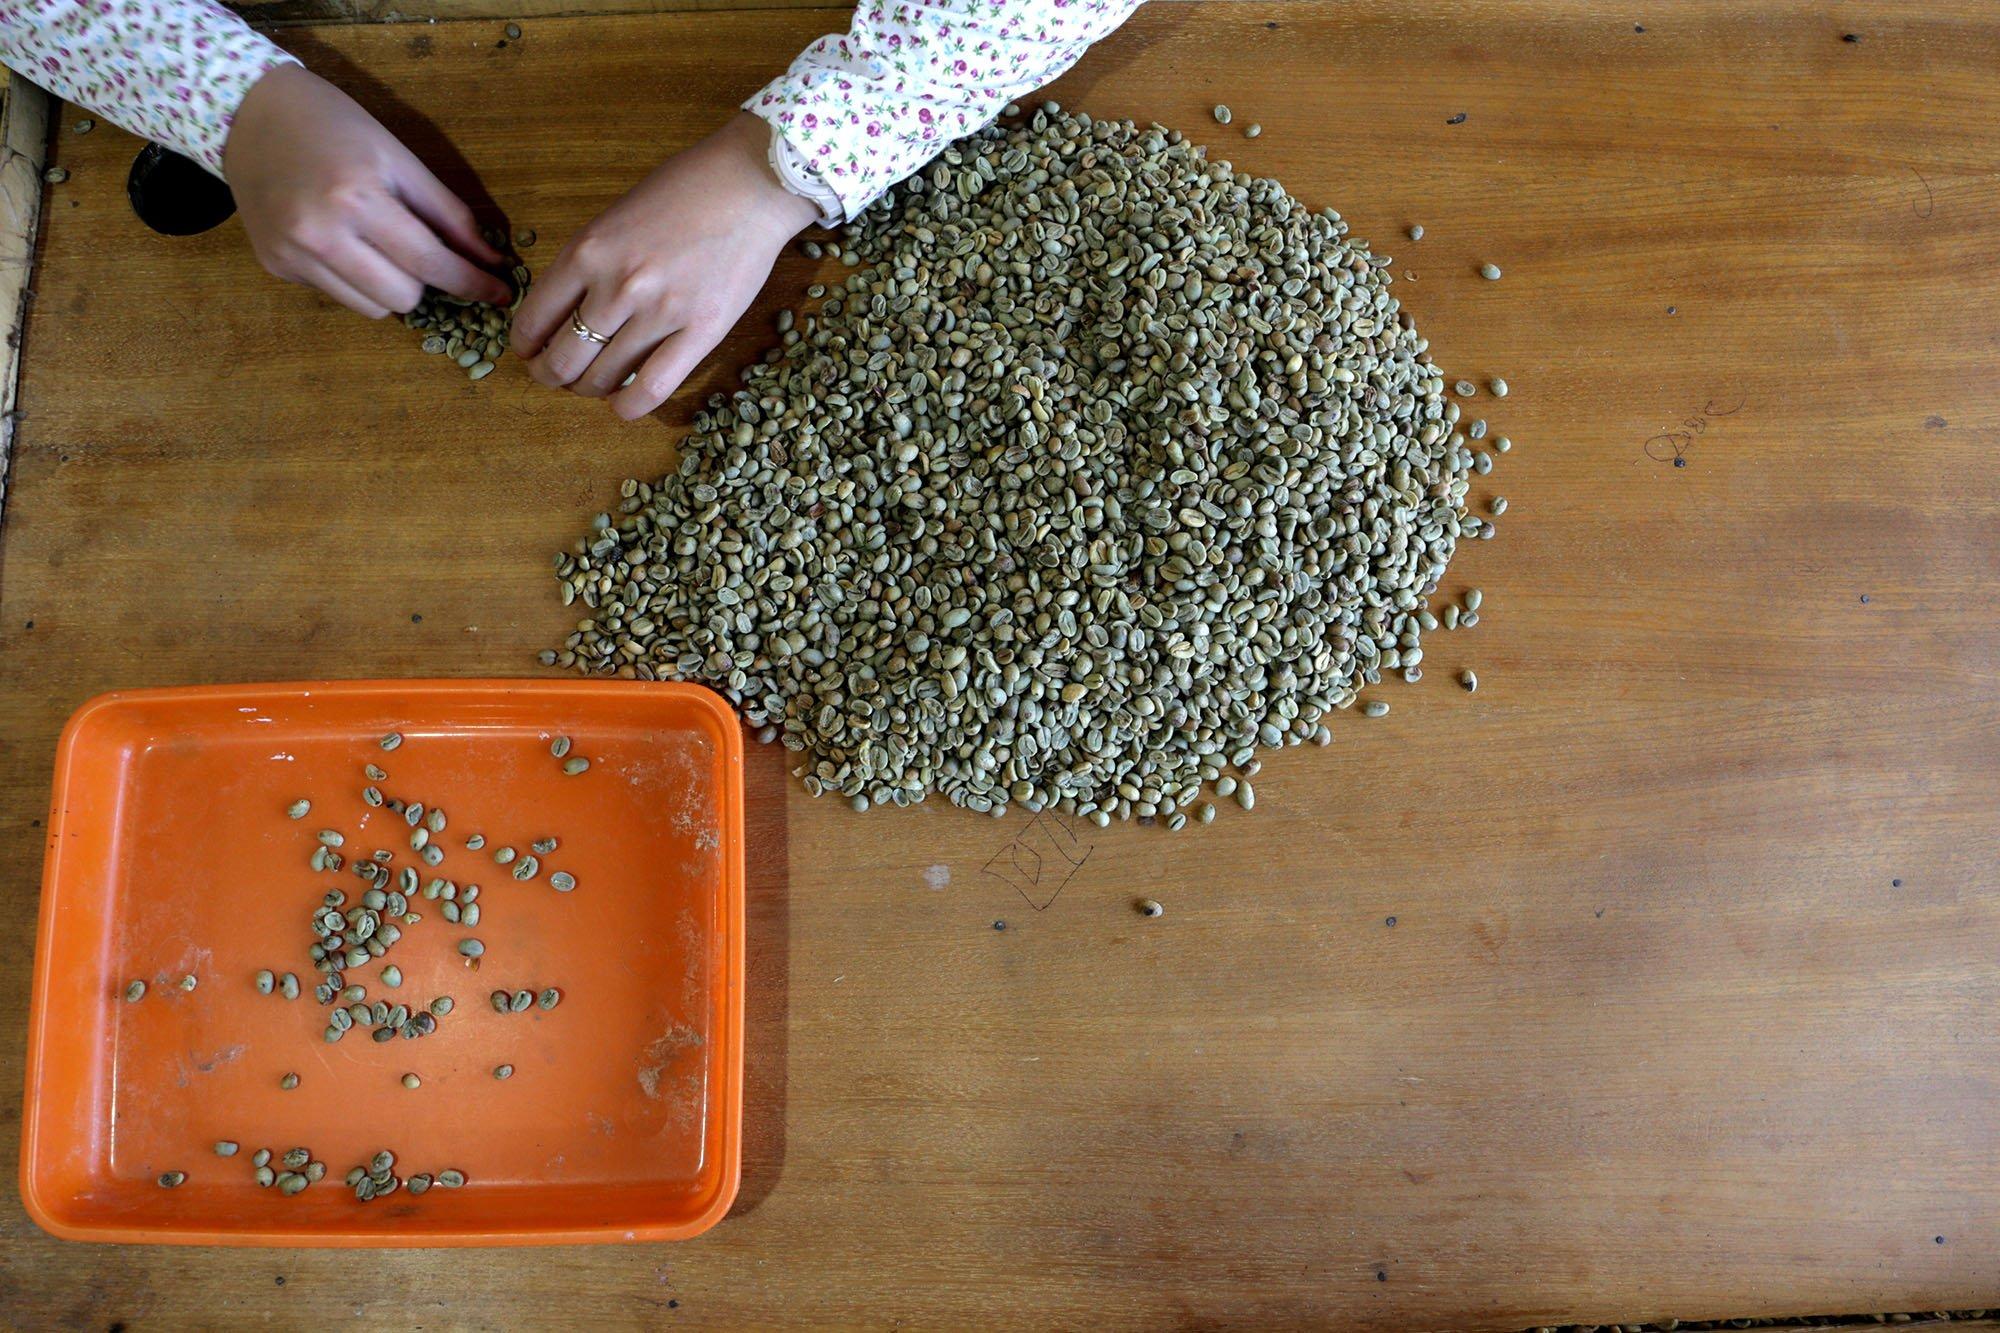 Proses penyortiran biji kopi dilakukan manual di Malabar Mpuntain Coffee, Bandung, Jawa Barat (15/11/2019).